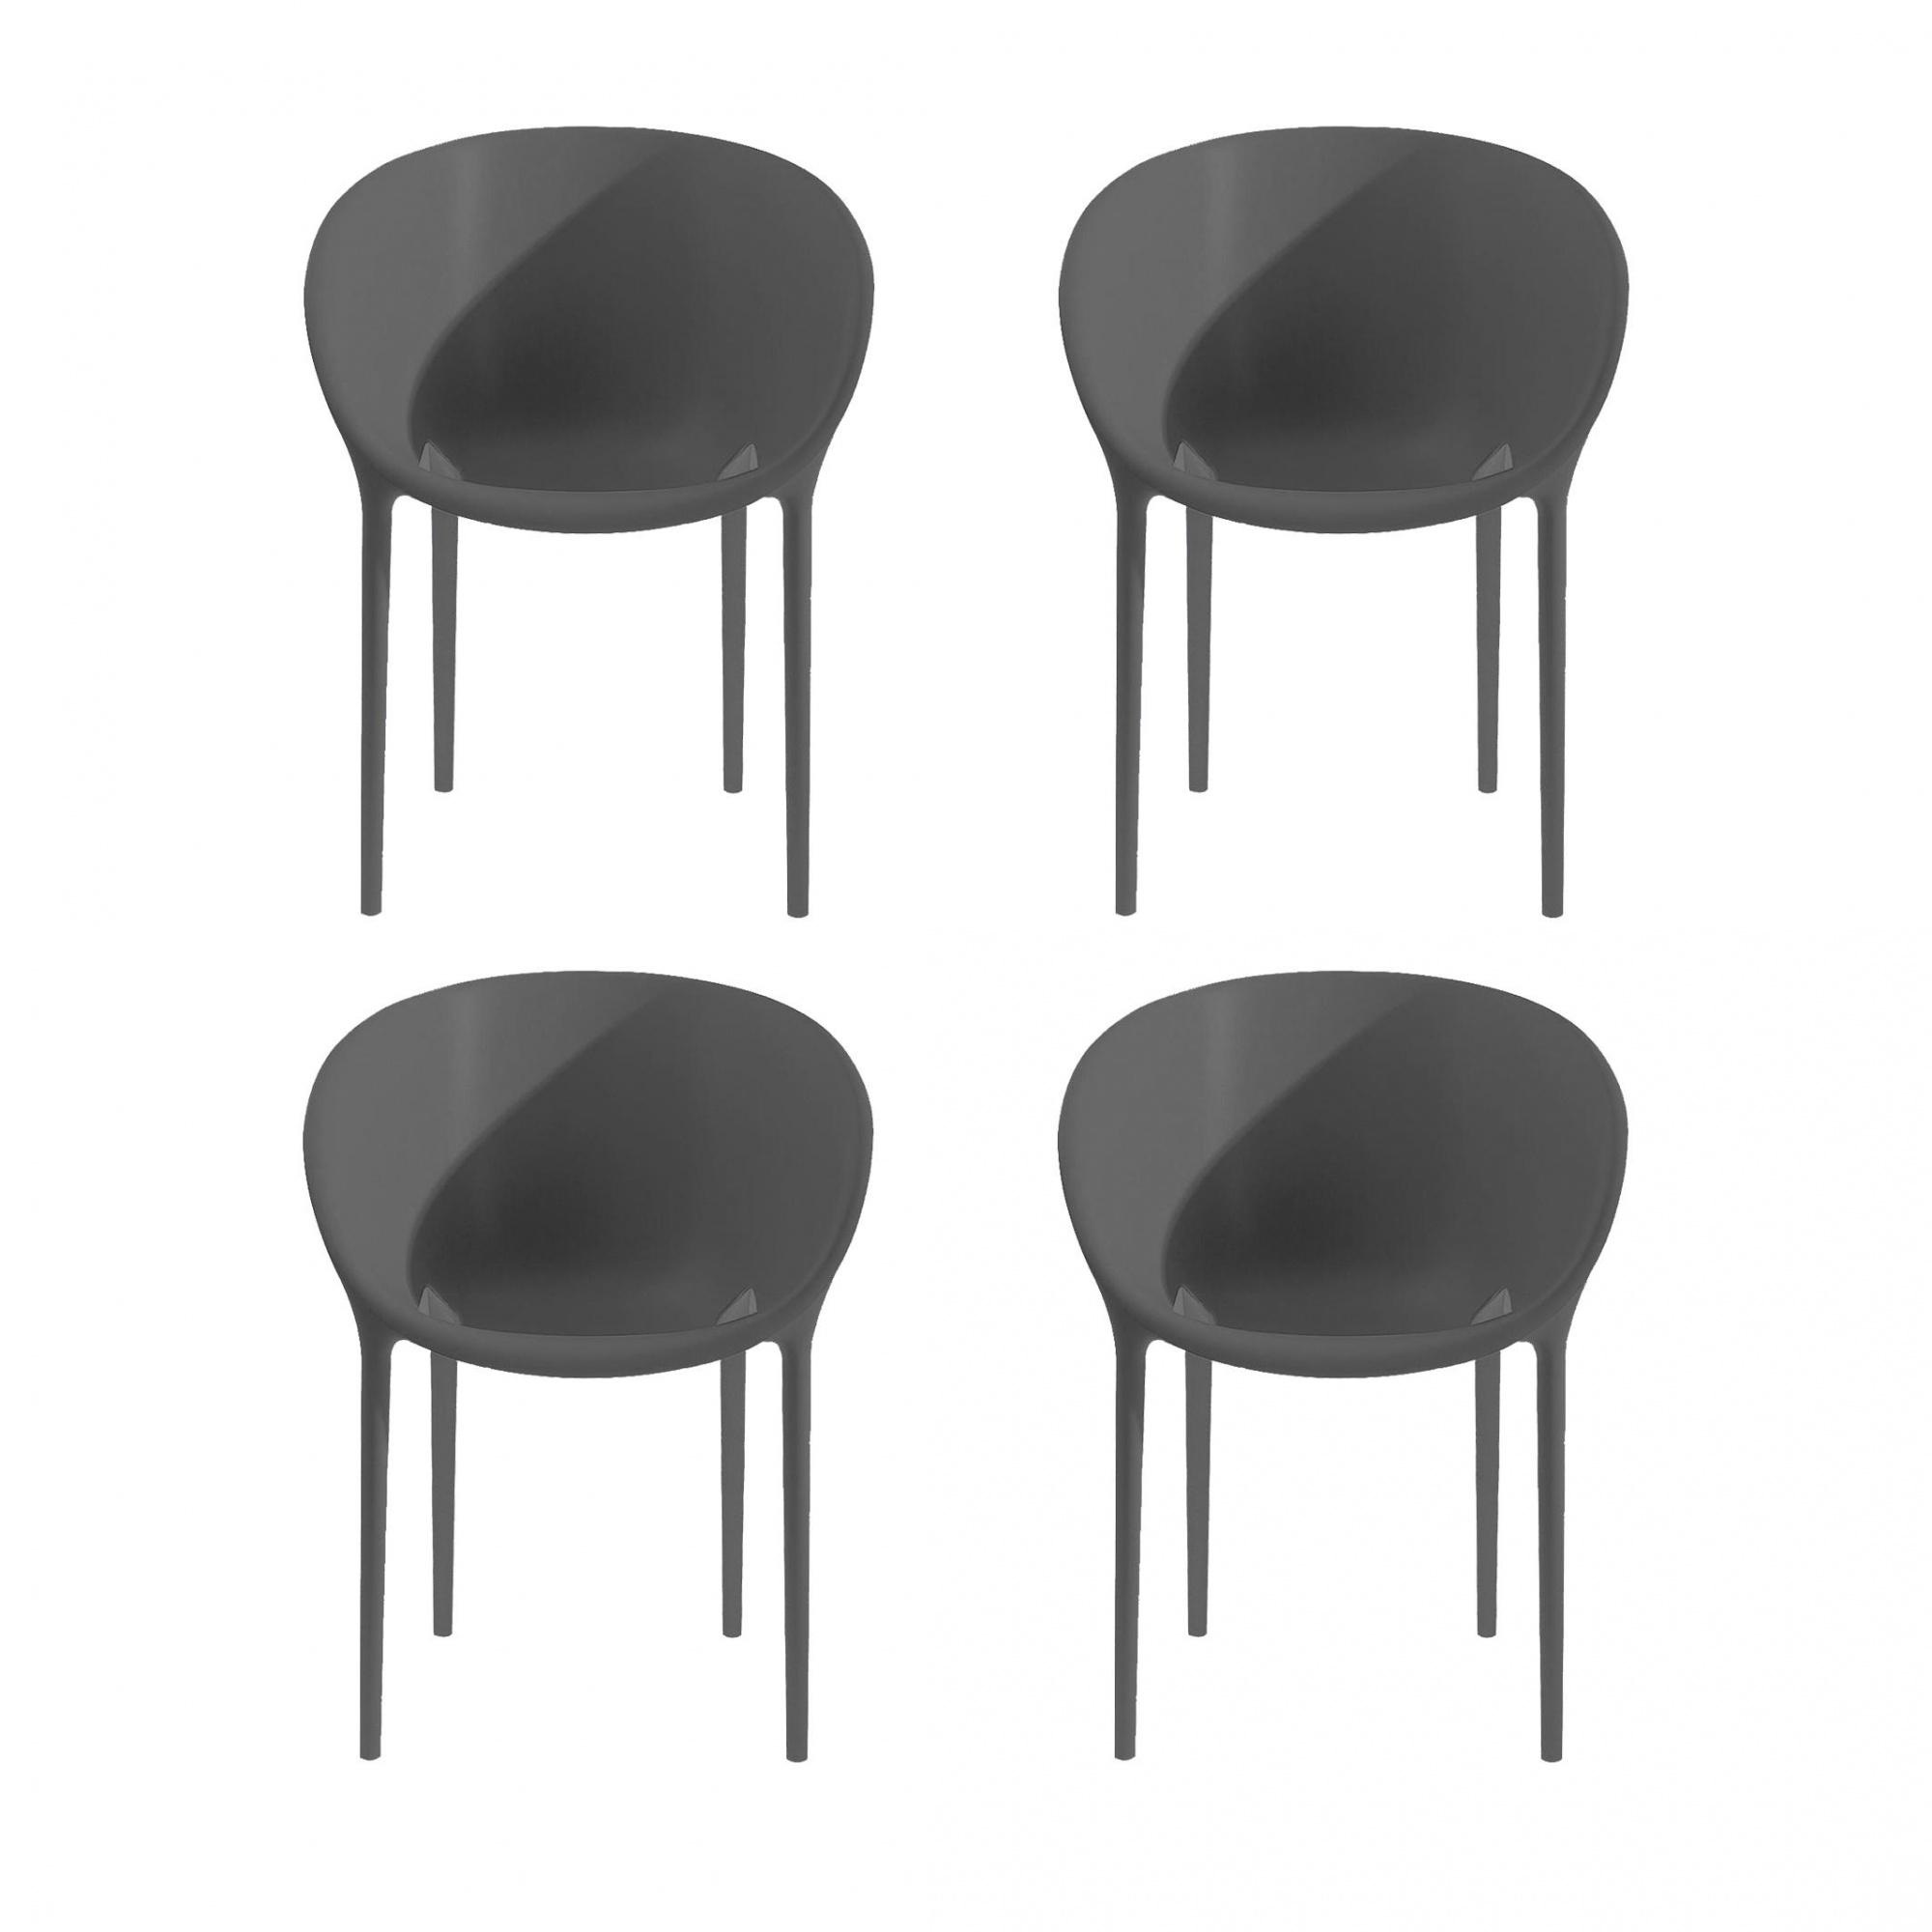 Driade - Soft Egg Gartenarmlehnstuhl 4er Set - dunkelgrau/Kunststoff/BxHxT 61x74x58cm/neue Farbe | Garten | Driade